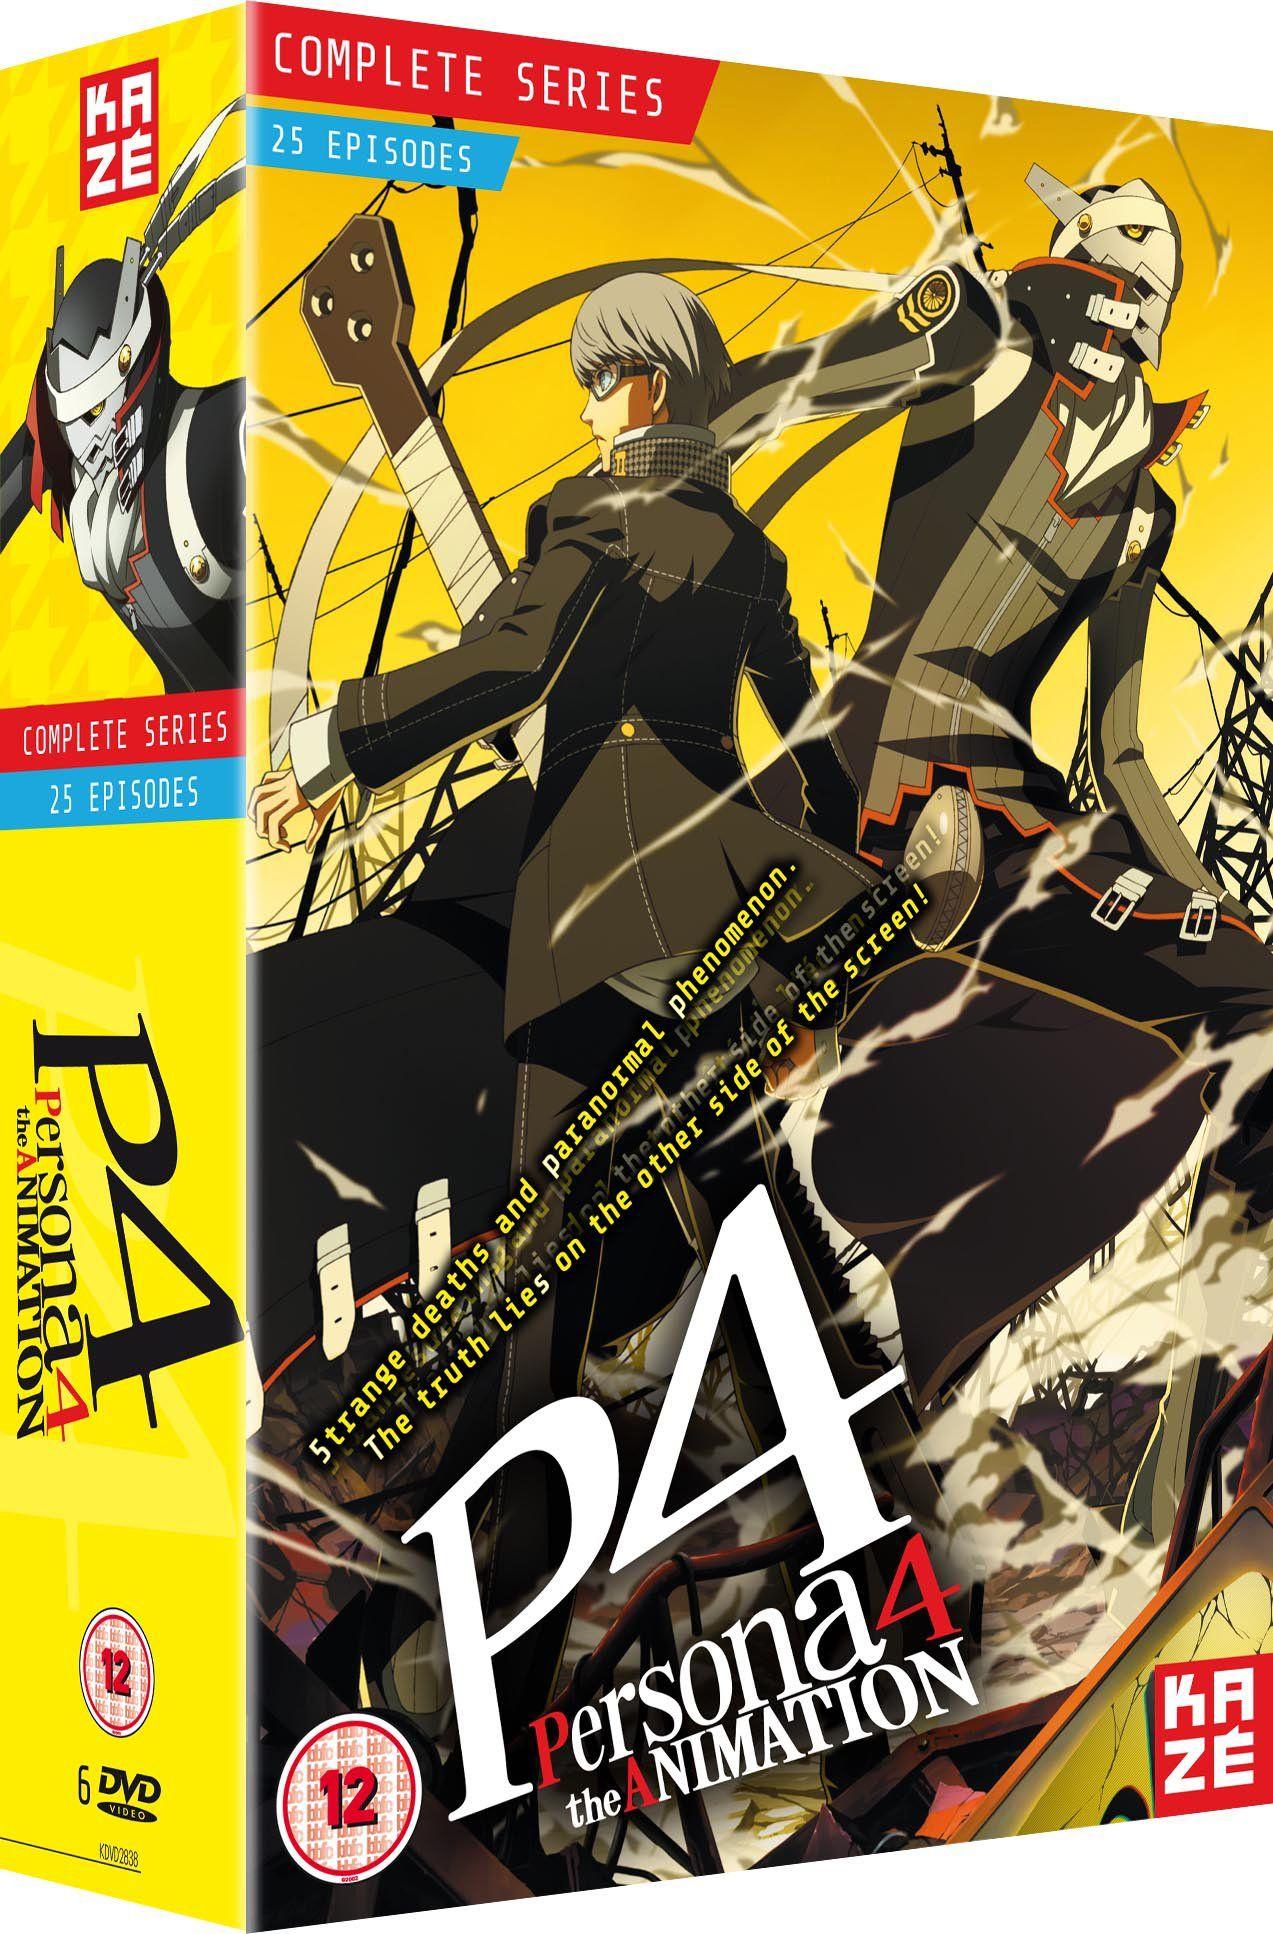 Persona 4 The Animation Complete Season Box Set Episodes